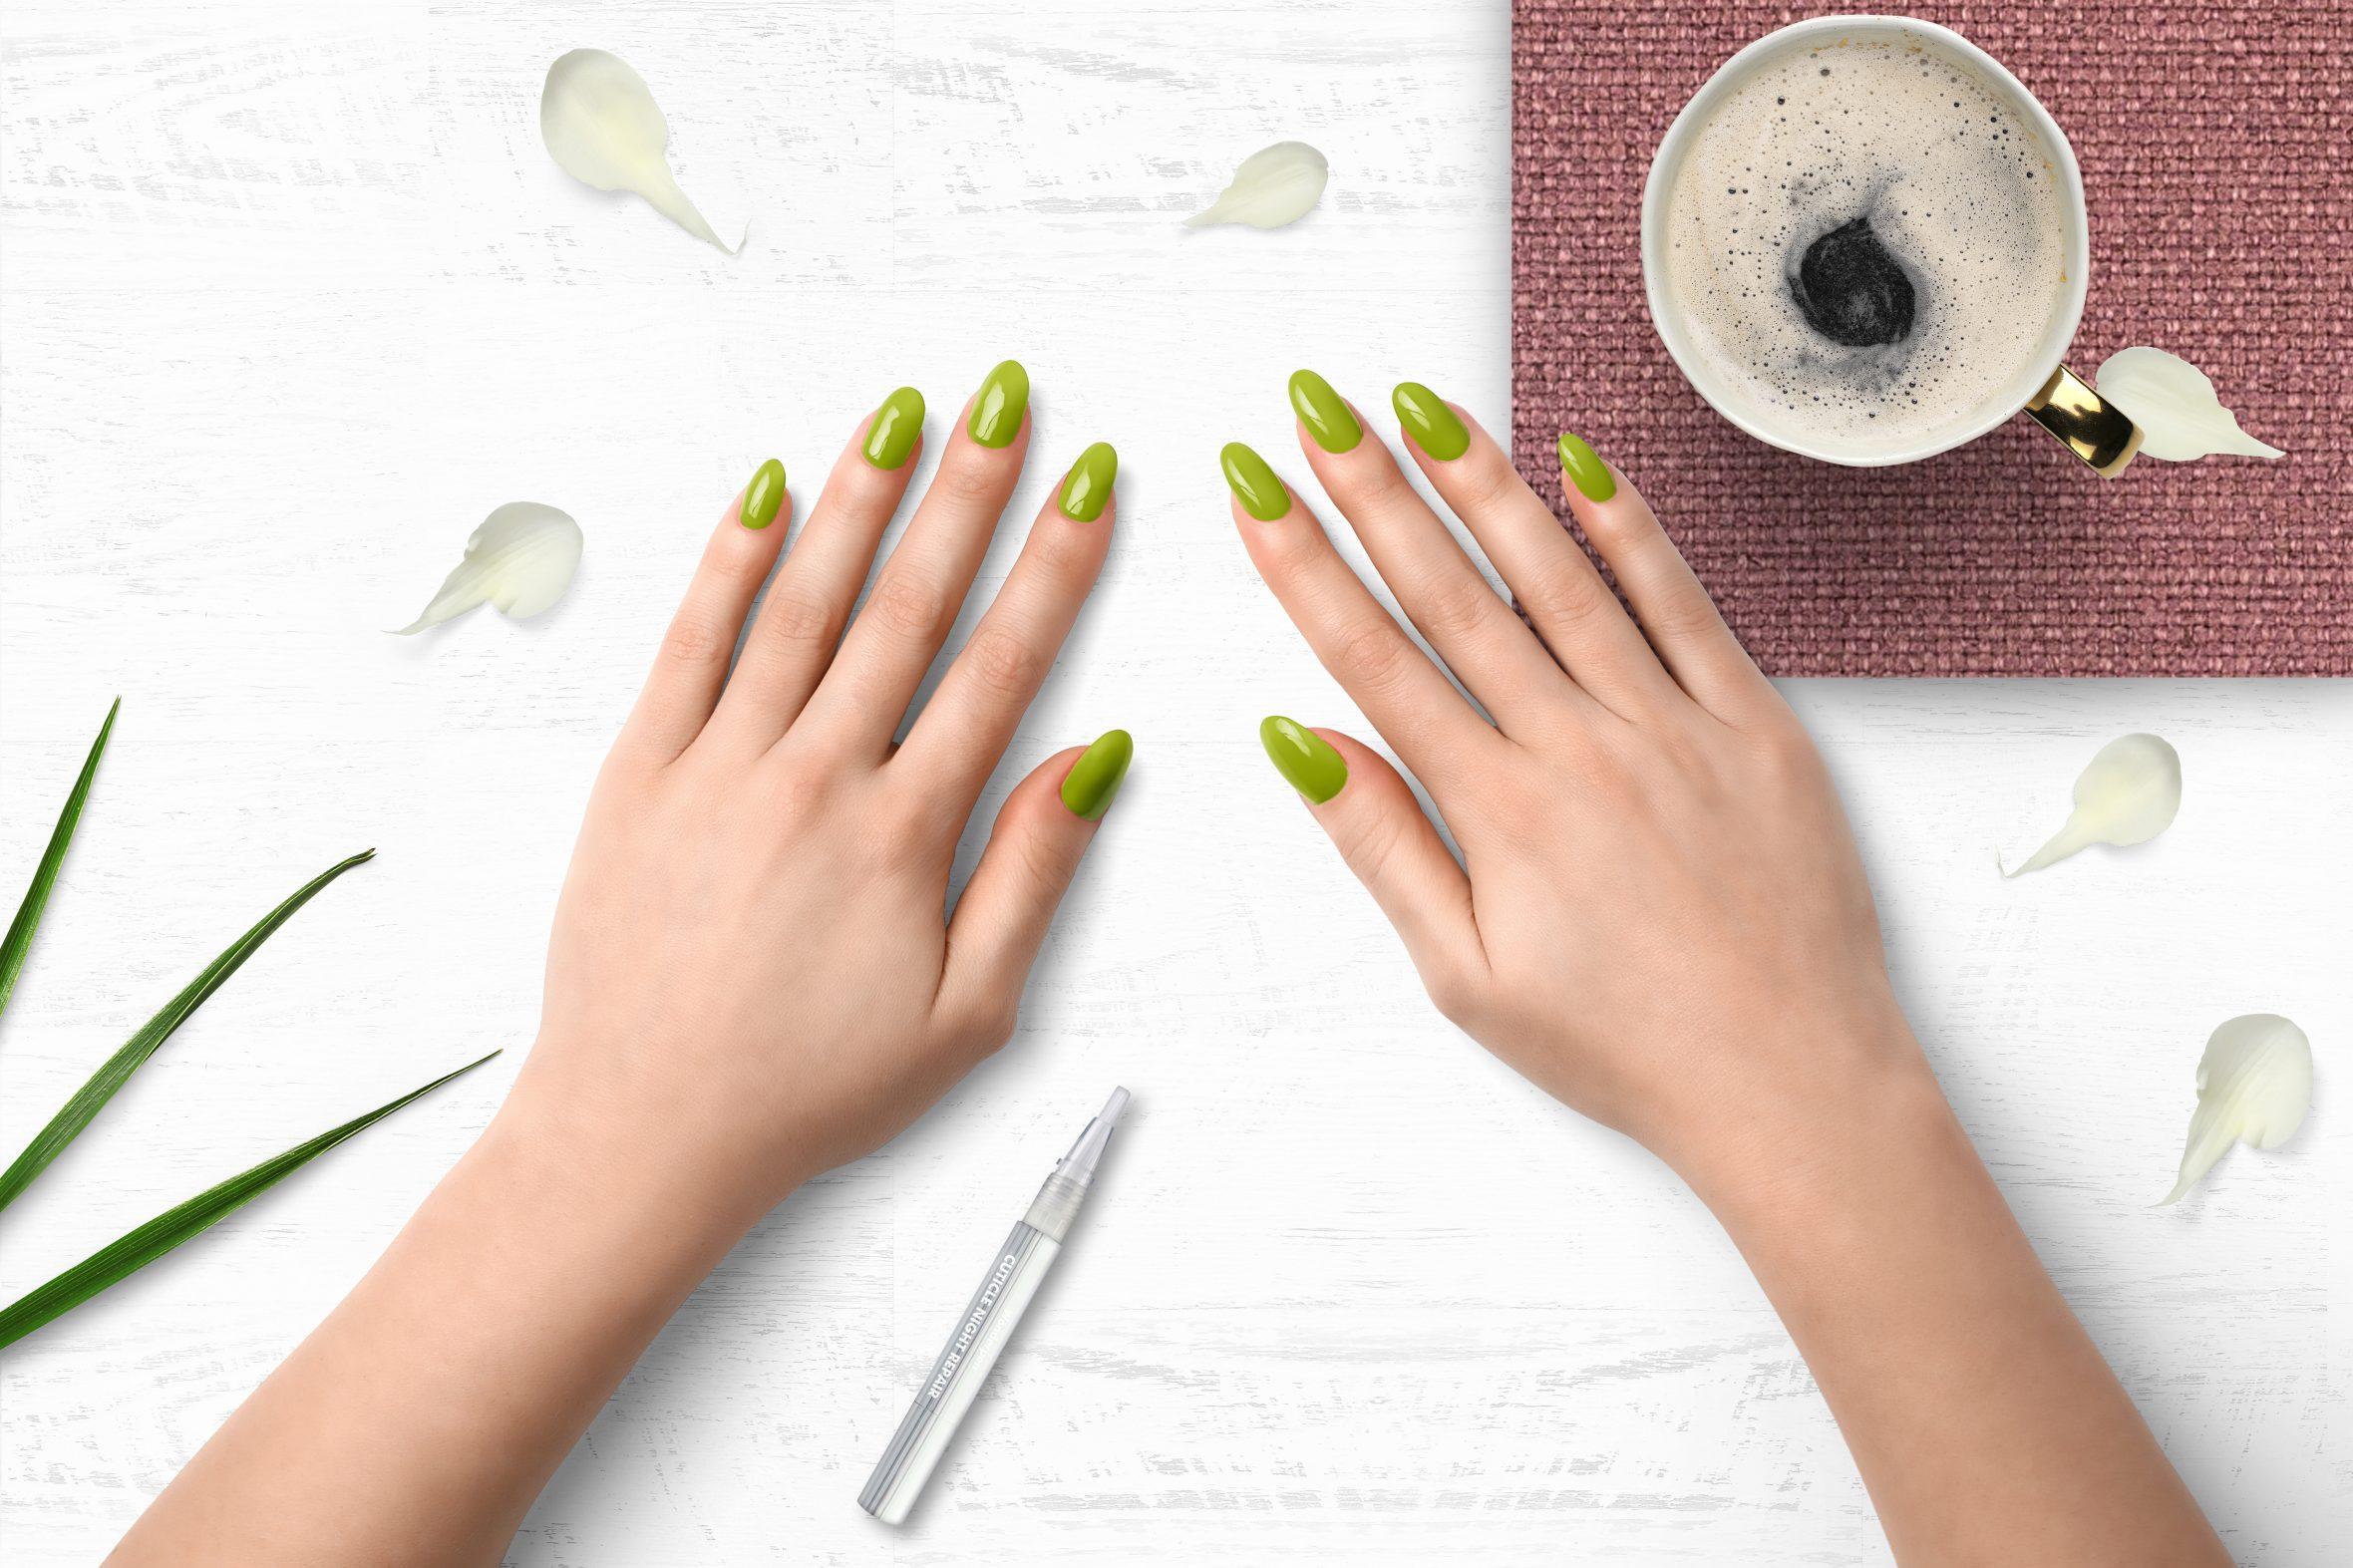 lime groene nagellak kleurnummer 172 van de Herôme nagellak kleuren